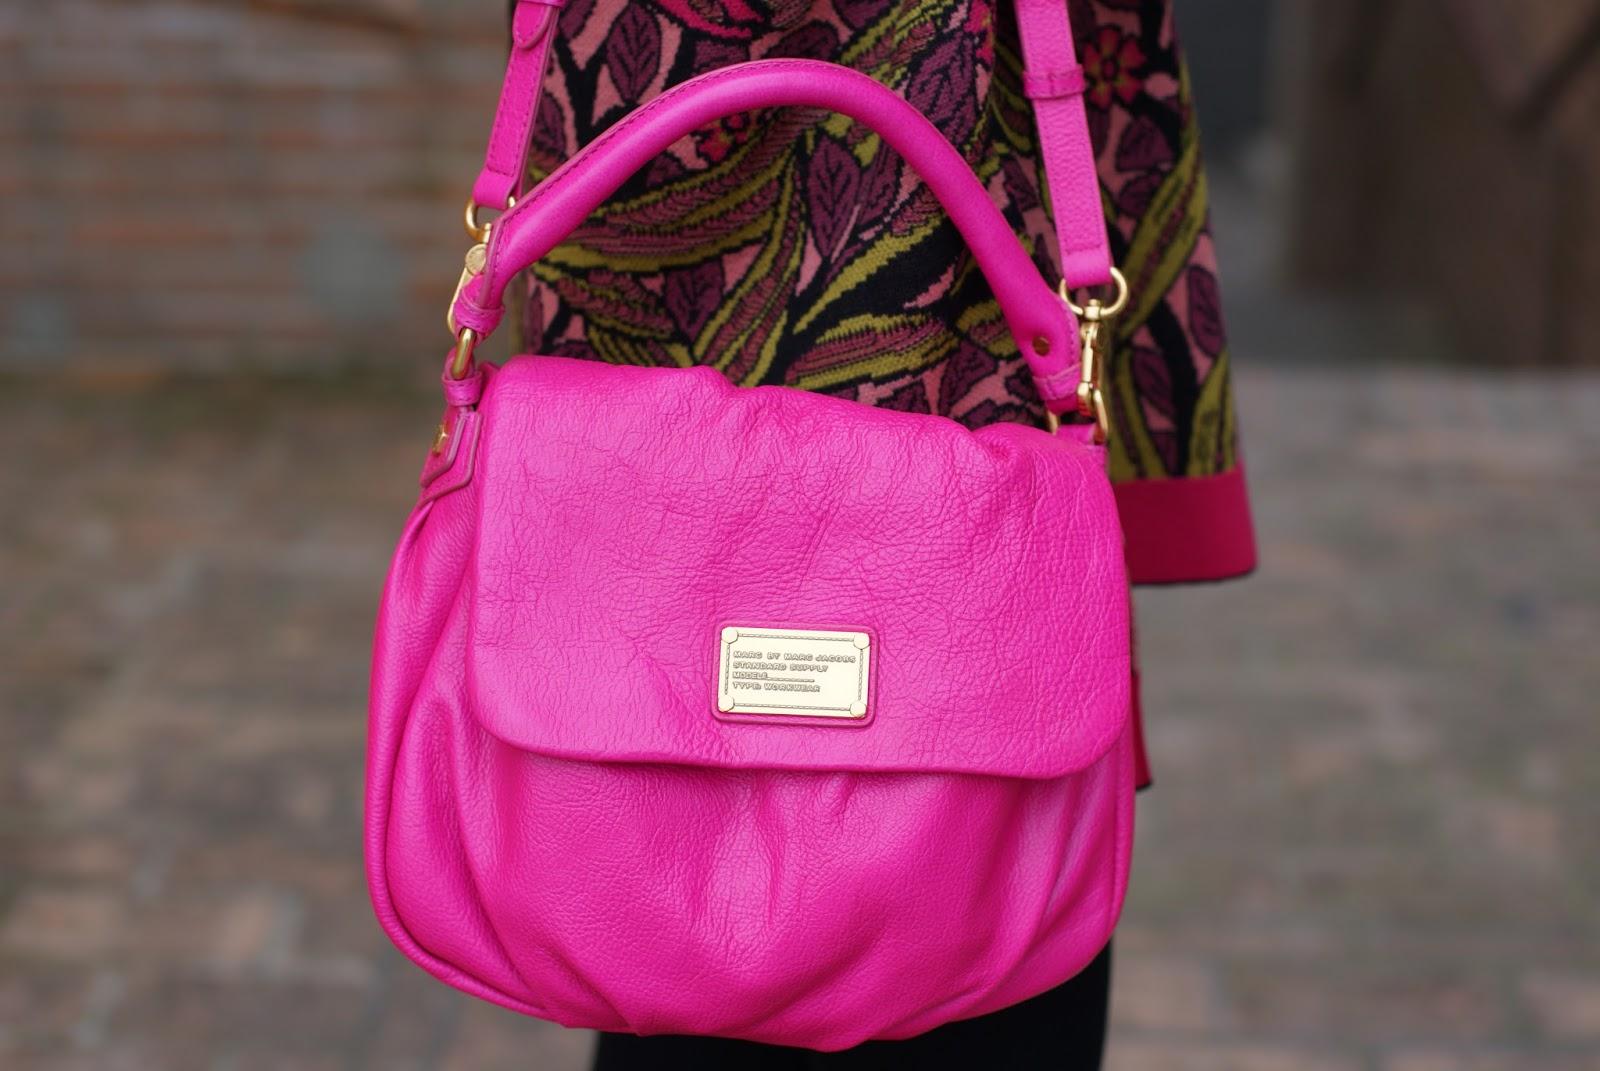 Marc by Marc Jacobs little ukita fuchsia bag on Fashion and Cookies fashion blog, fashion blogger